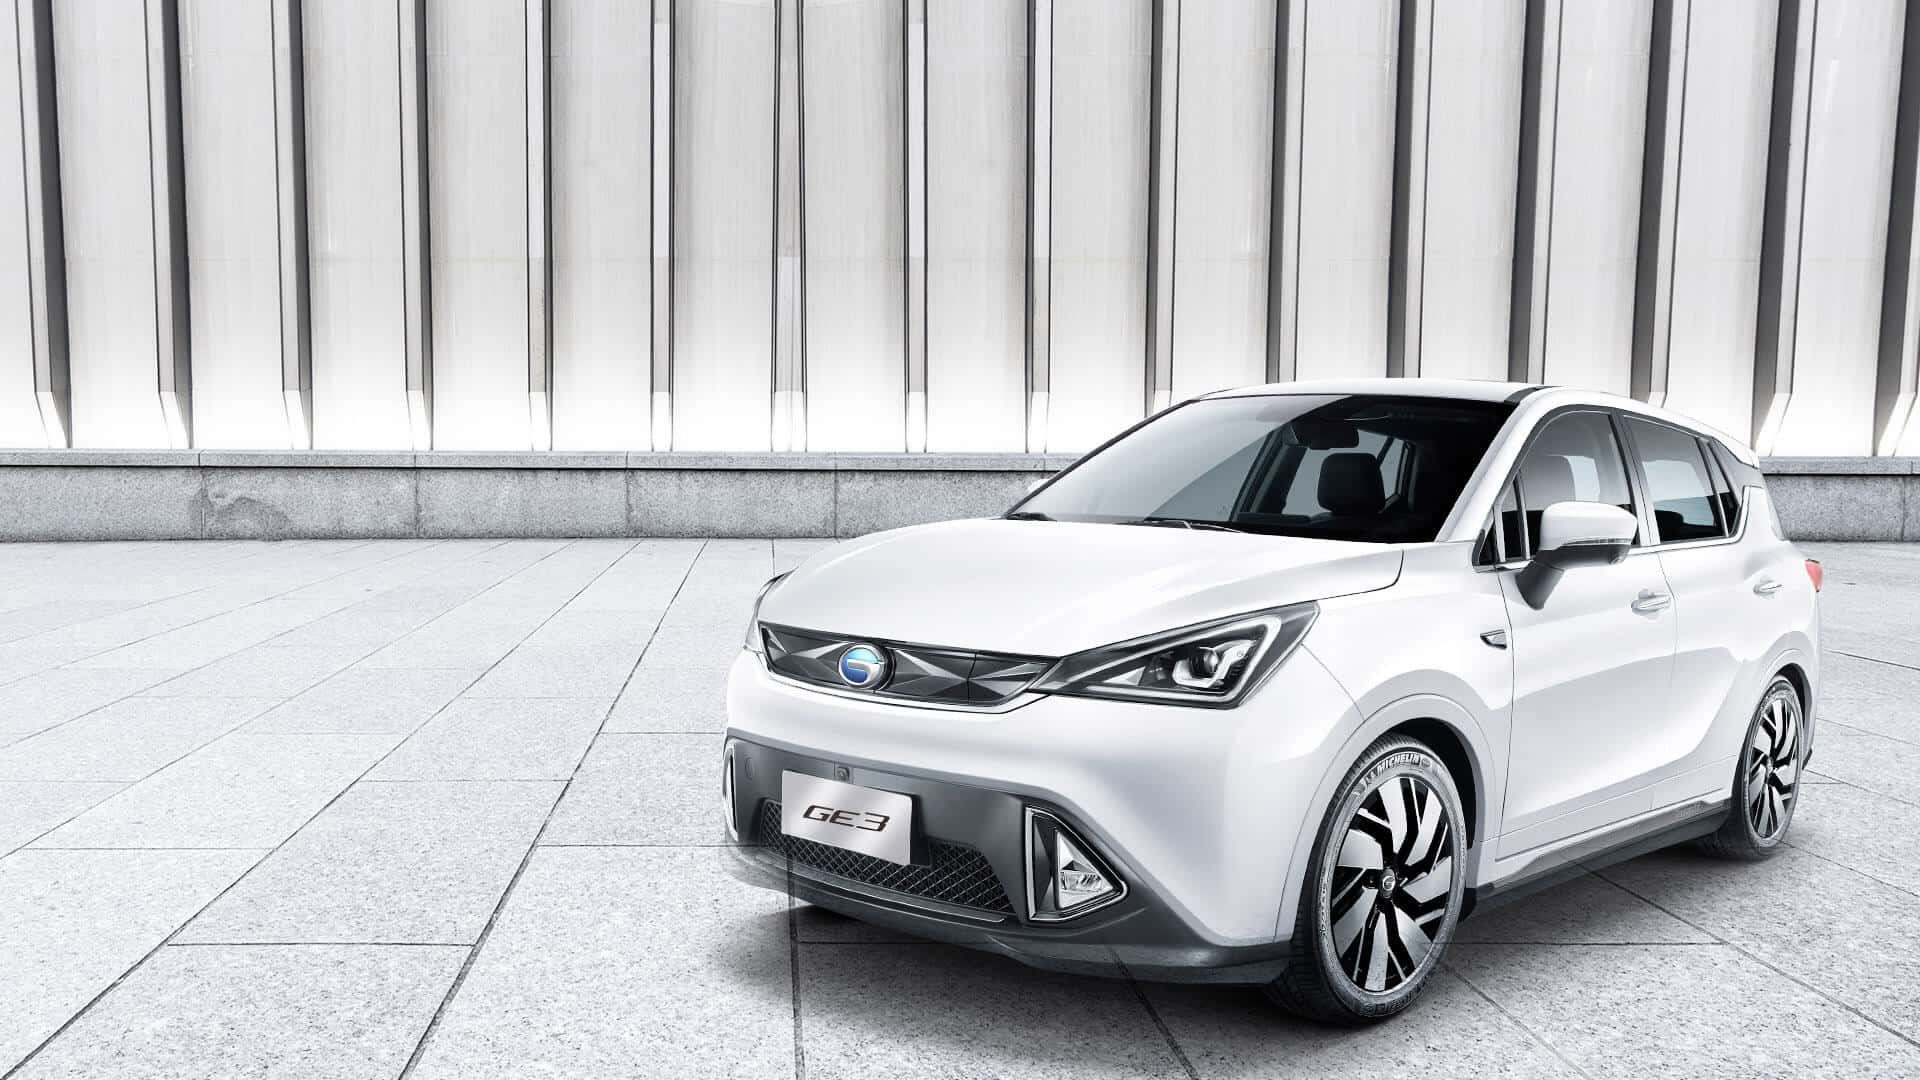 GAC - הרכב החשמלי הסיני GE3 | צילומים: יצרן